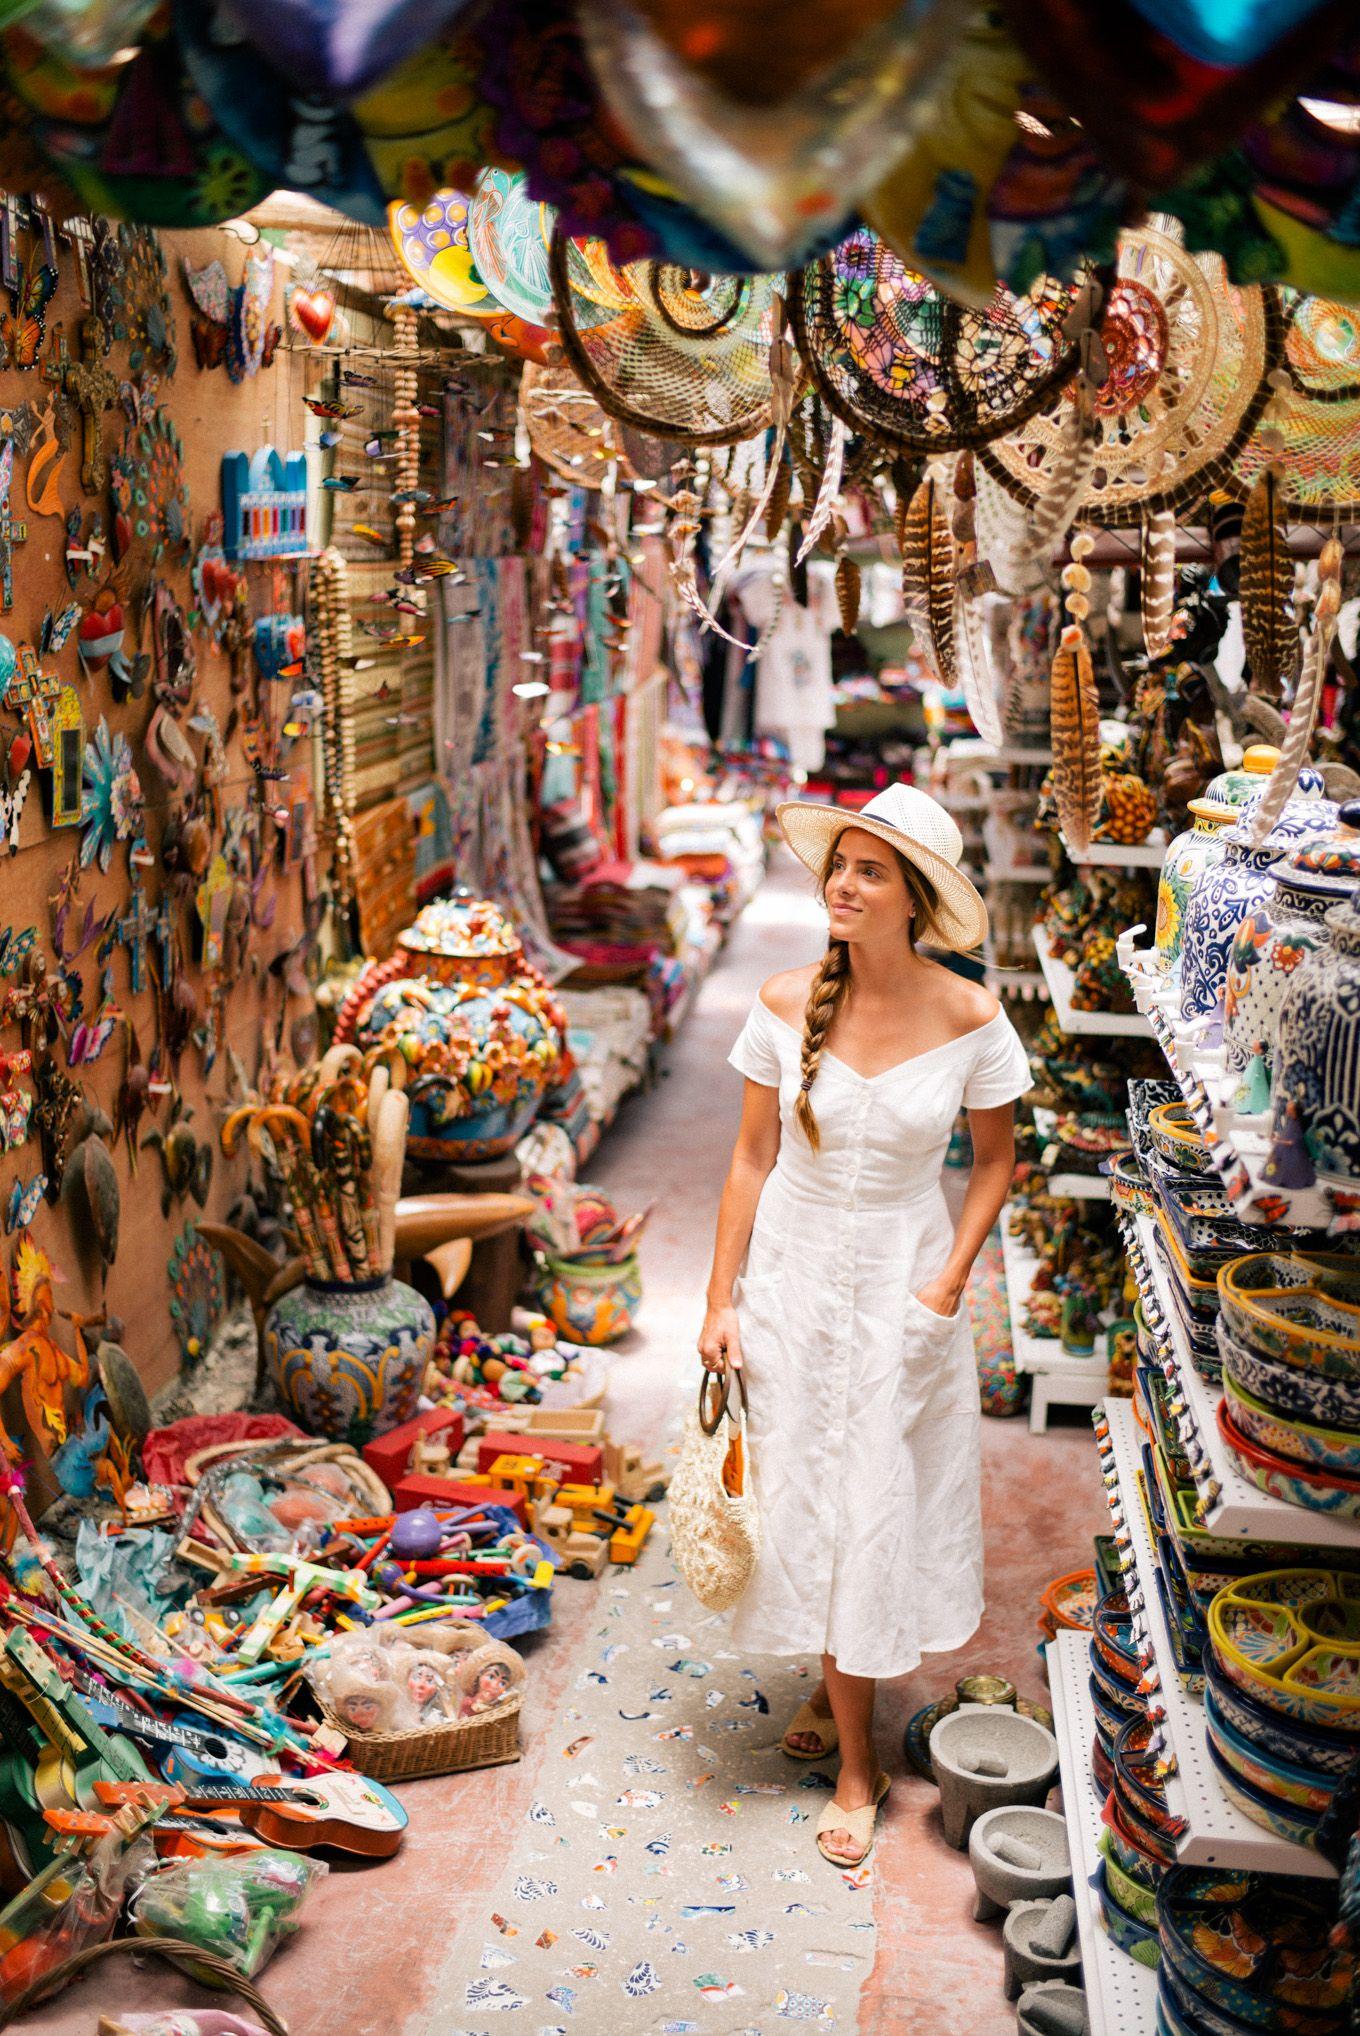 Shopping In Tulum Julia Berolzheimer Tulum Travel Tulum